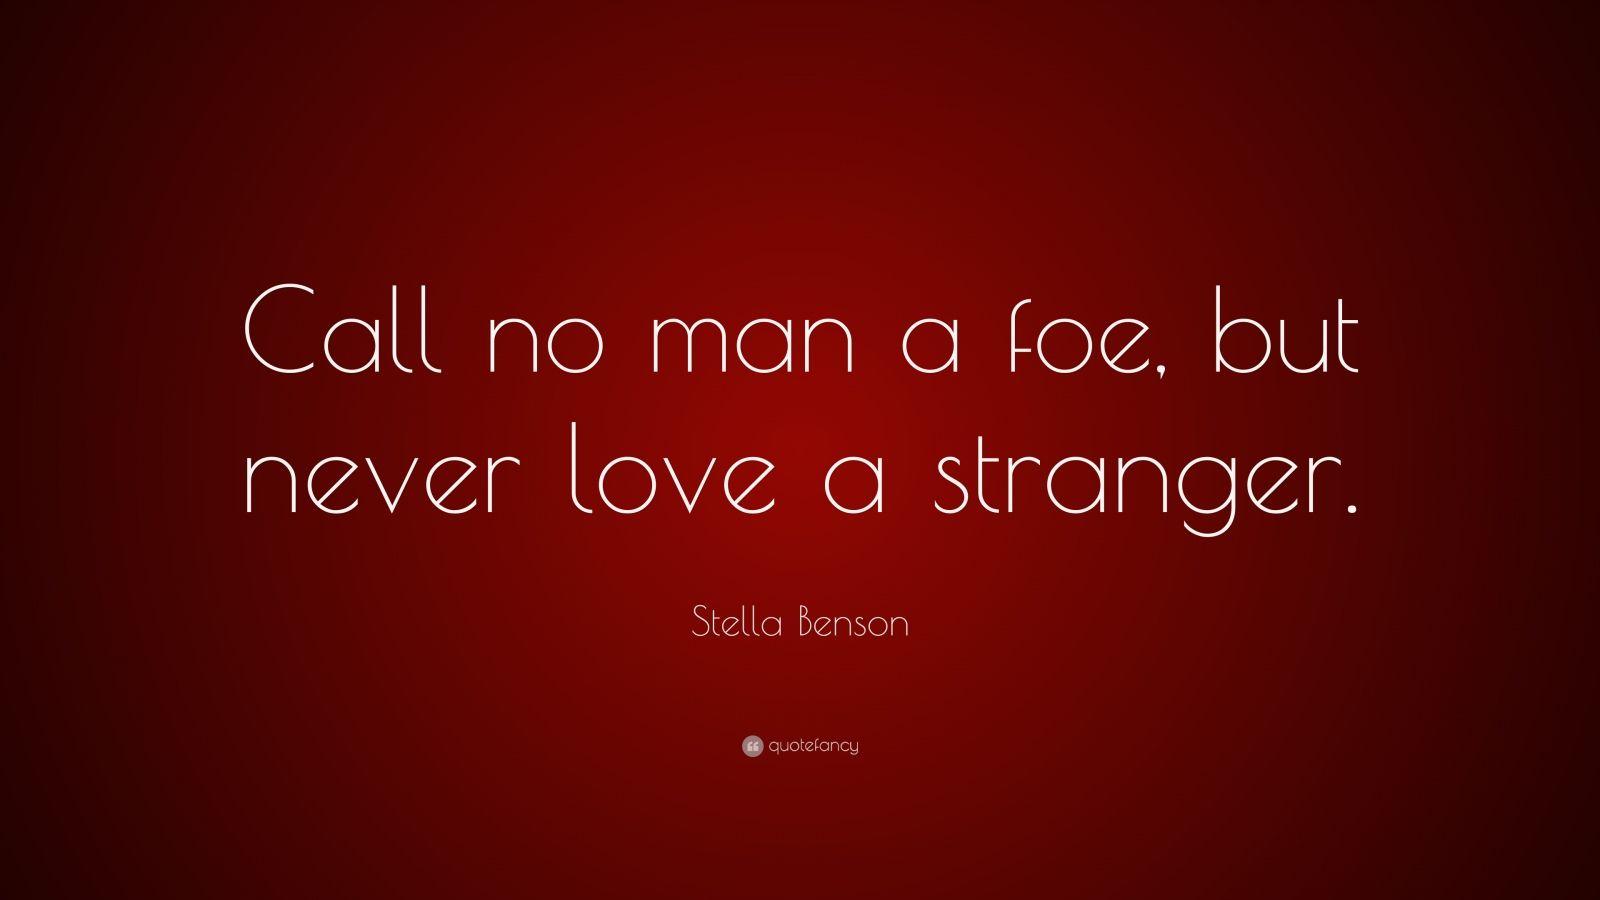 Stella benson quotes